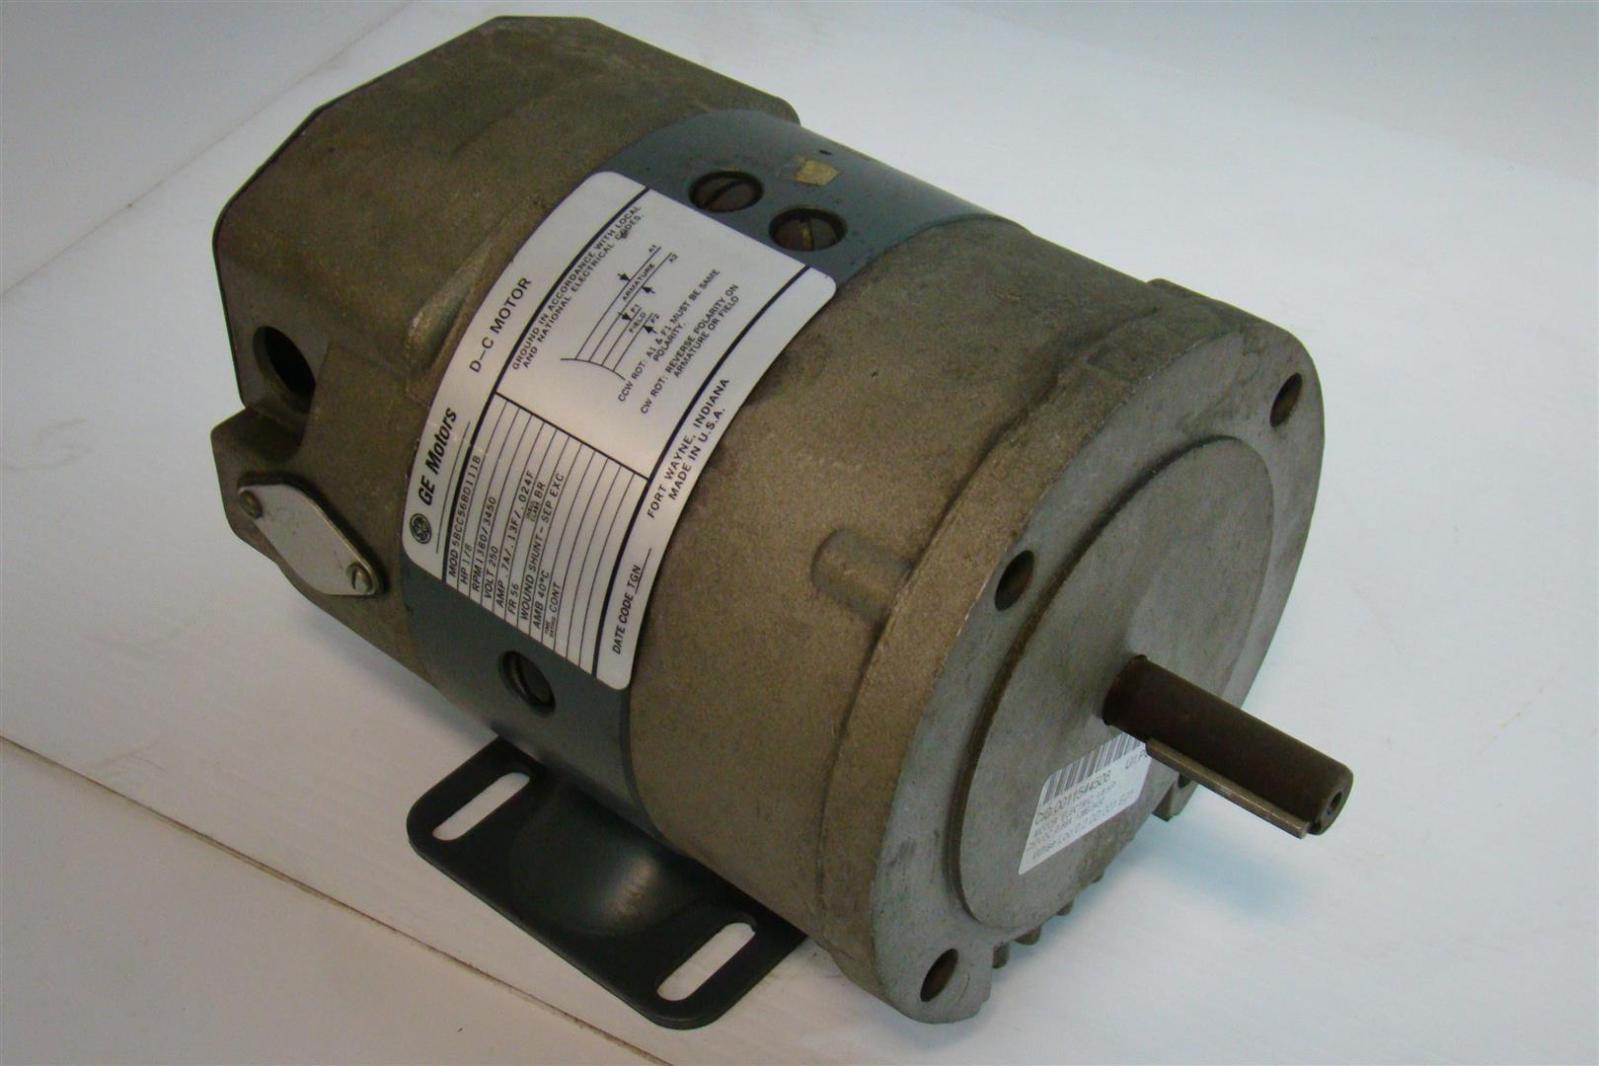 General electric dc motors 1 8hp 1380 3450rpm 250v 7a for General electric dc motors